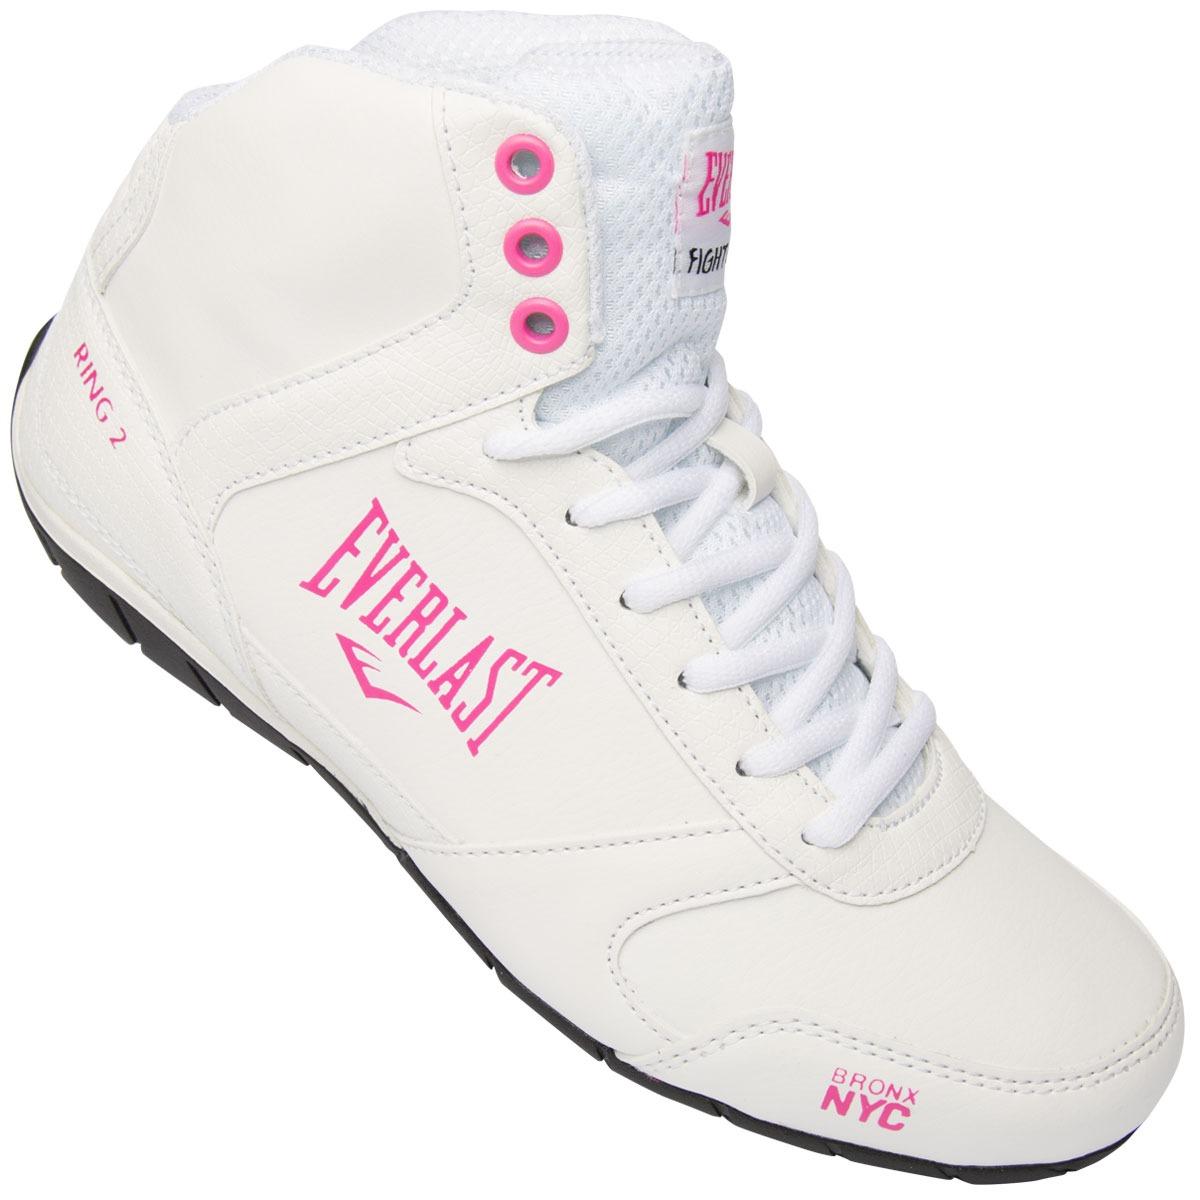 tênis everlast ring 2 branco e rosa - feminino. Carregando zoom. 8bffe288a3c95